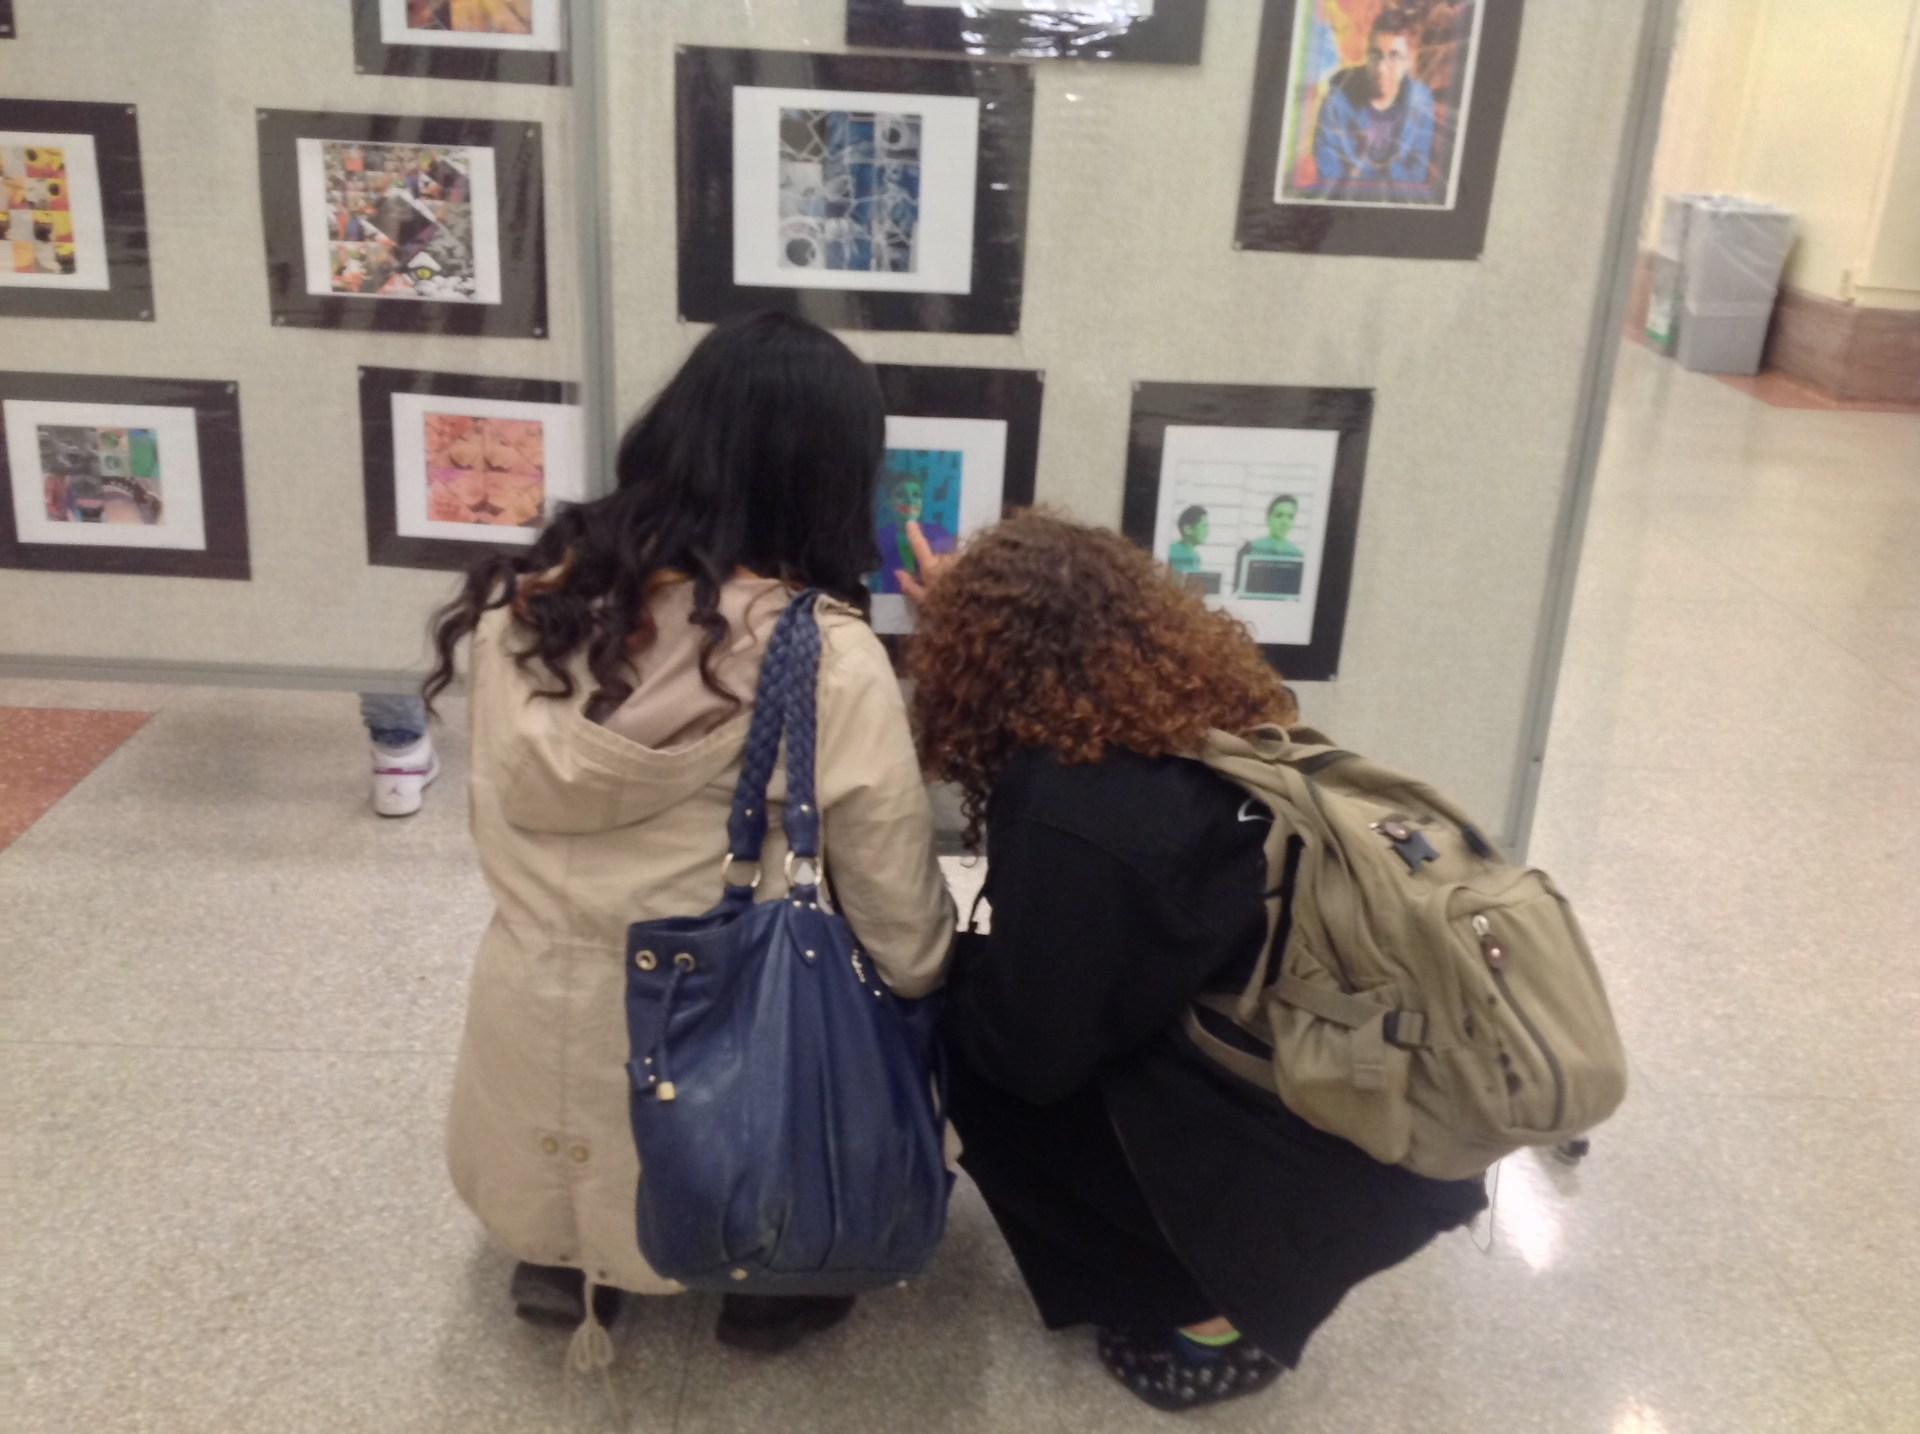 Students looking at artwork at exhibit.